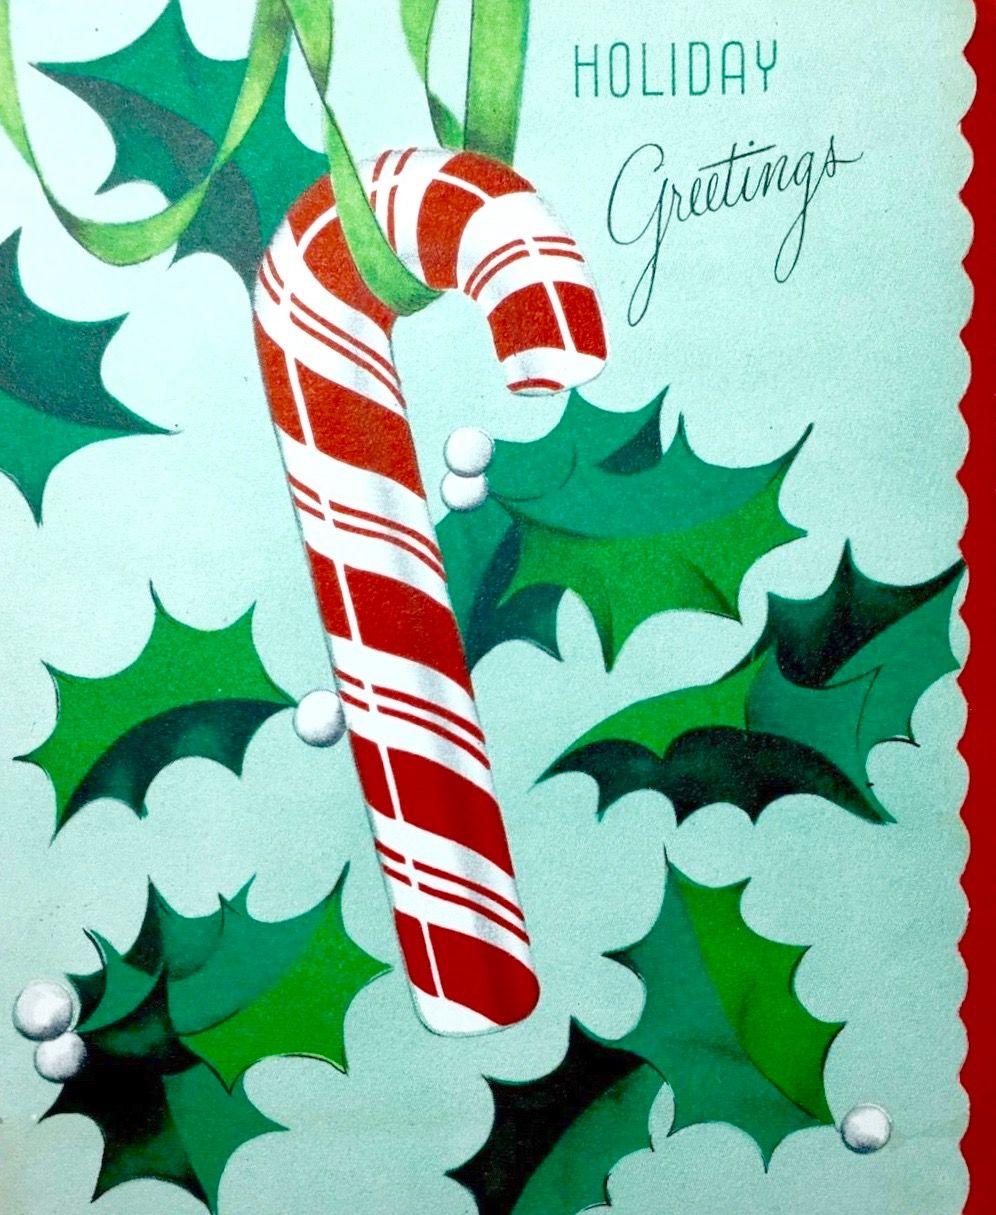 Vintage candy cane retro christmas card holiday greetings vintage candy cane retro christmas card holiday greetings kristyandbryce Image collections